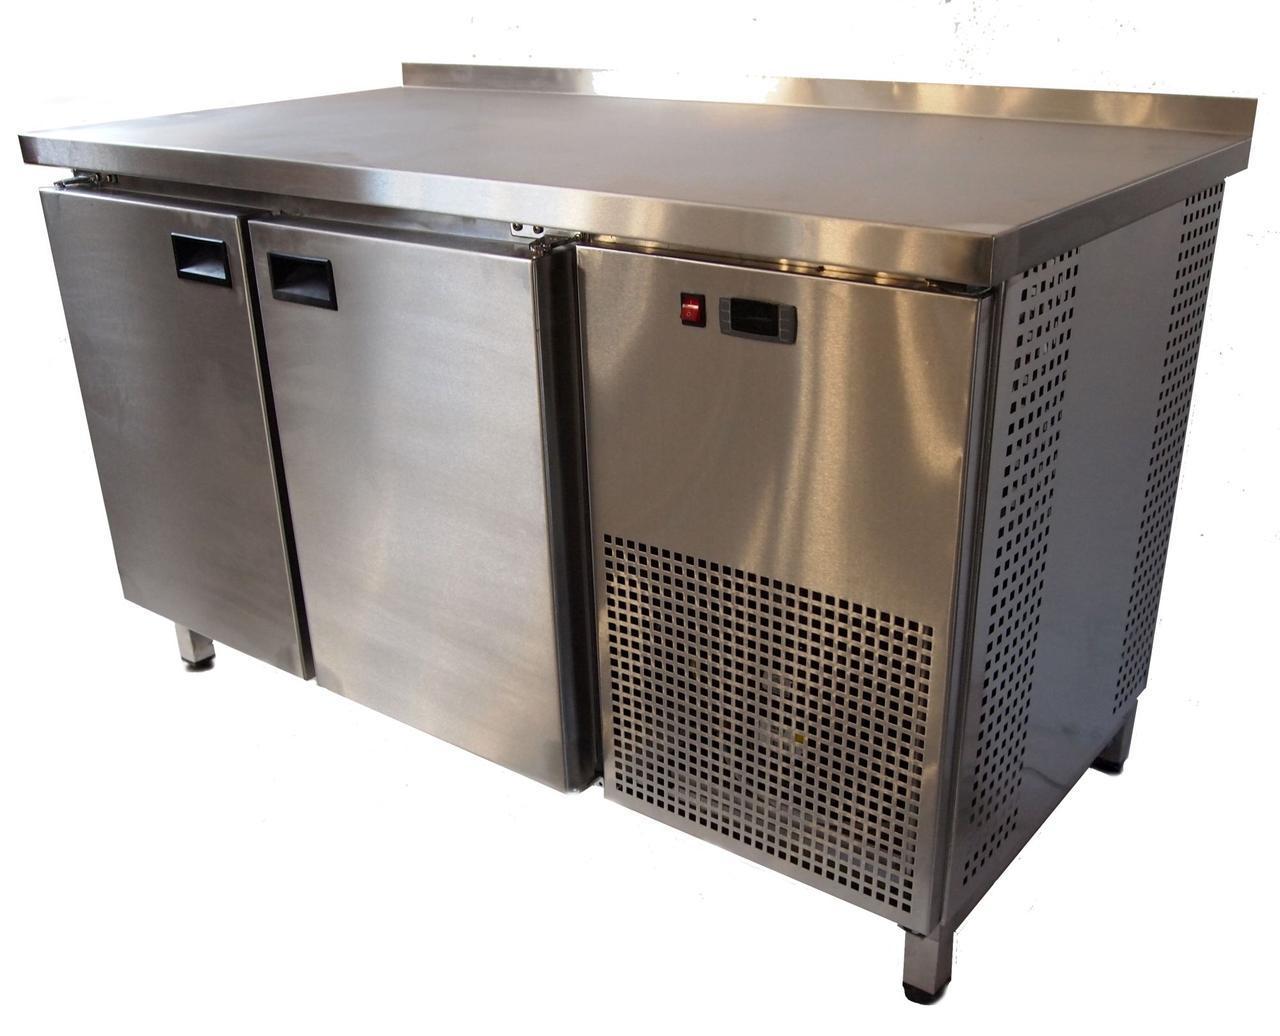 Стол холодильный 1400*700*850 с бортом, 2-х дверный